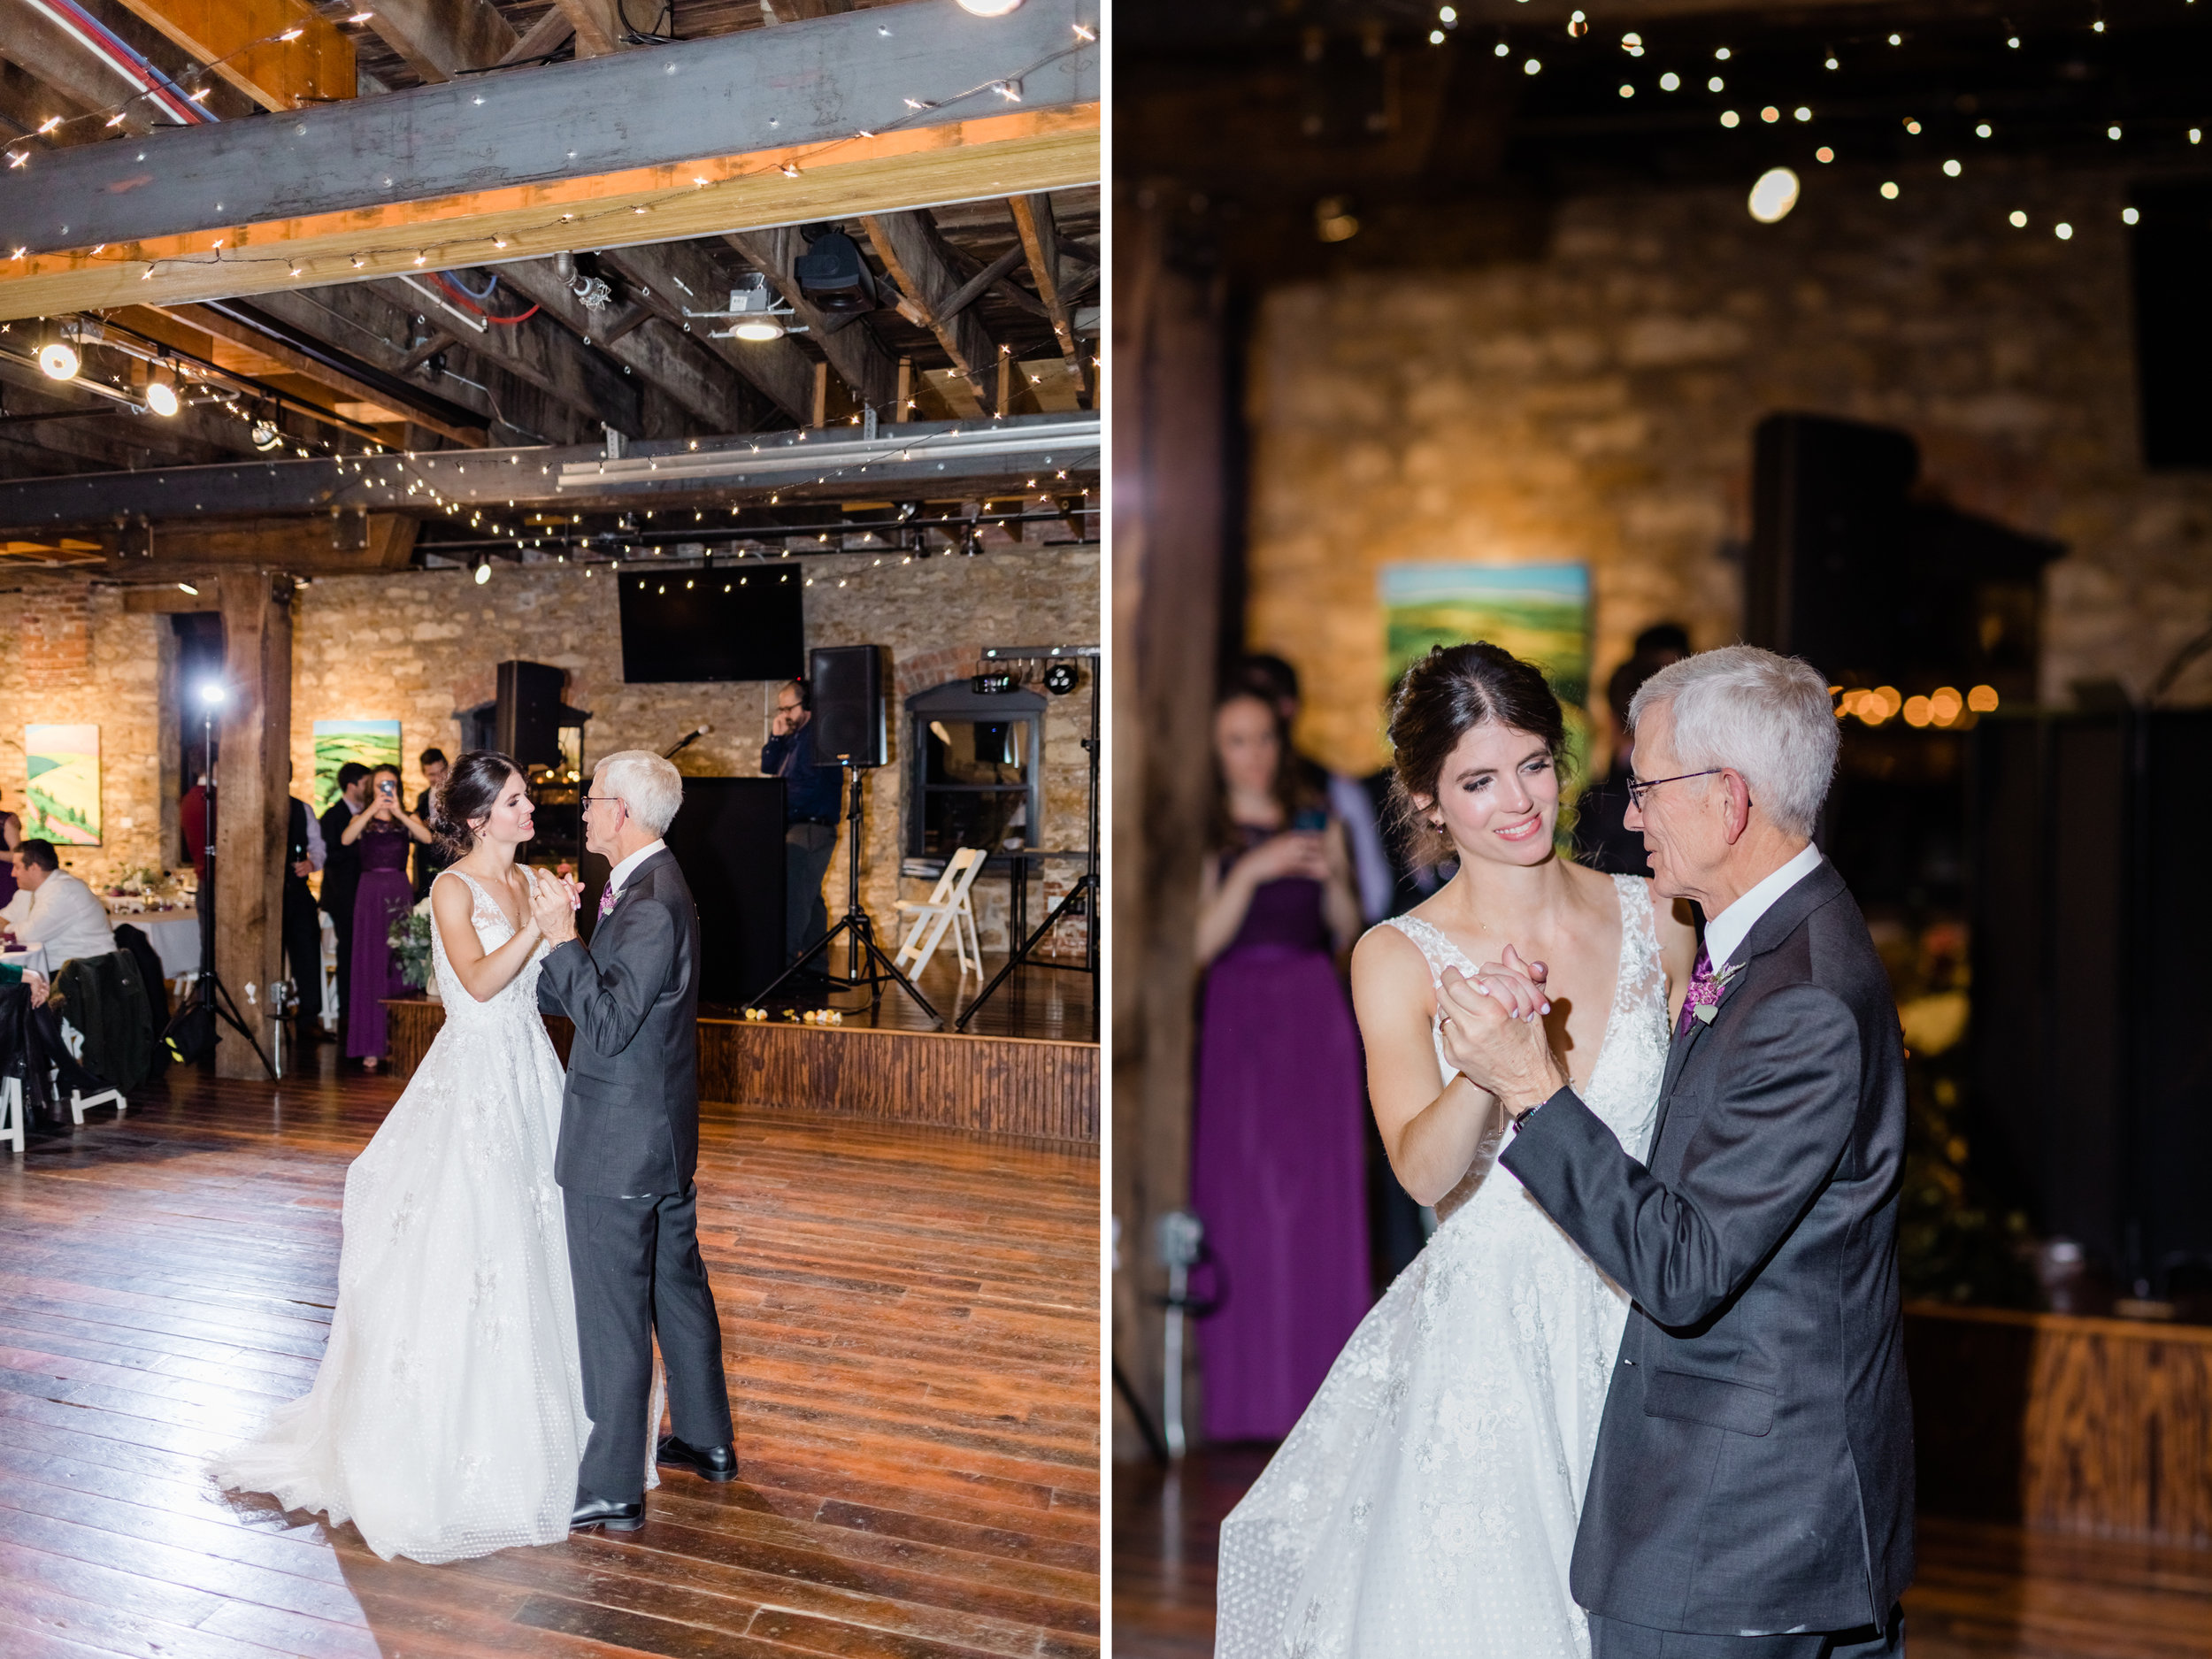 Lawrence Kansas Wedding Cider Gallery 2.jpg